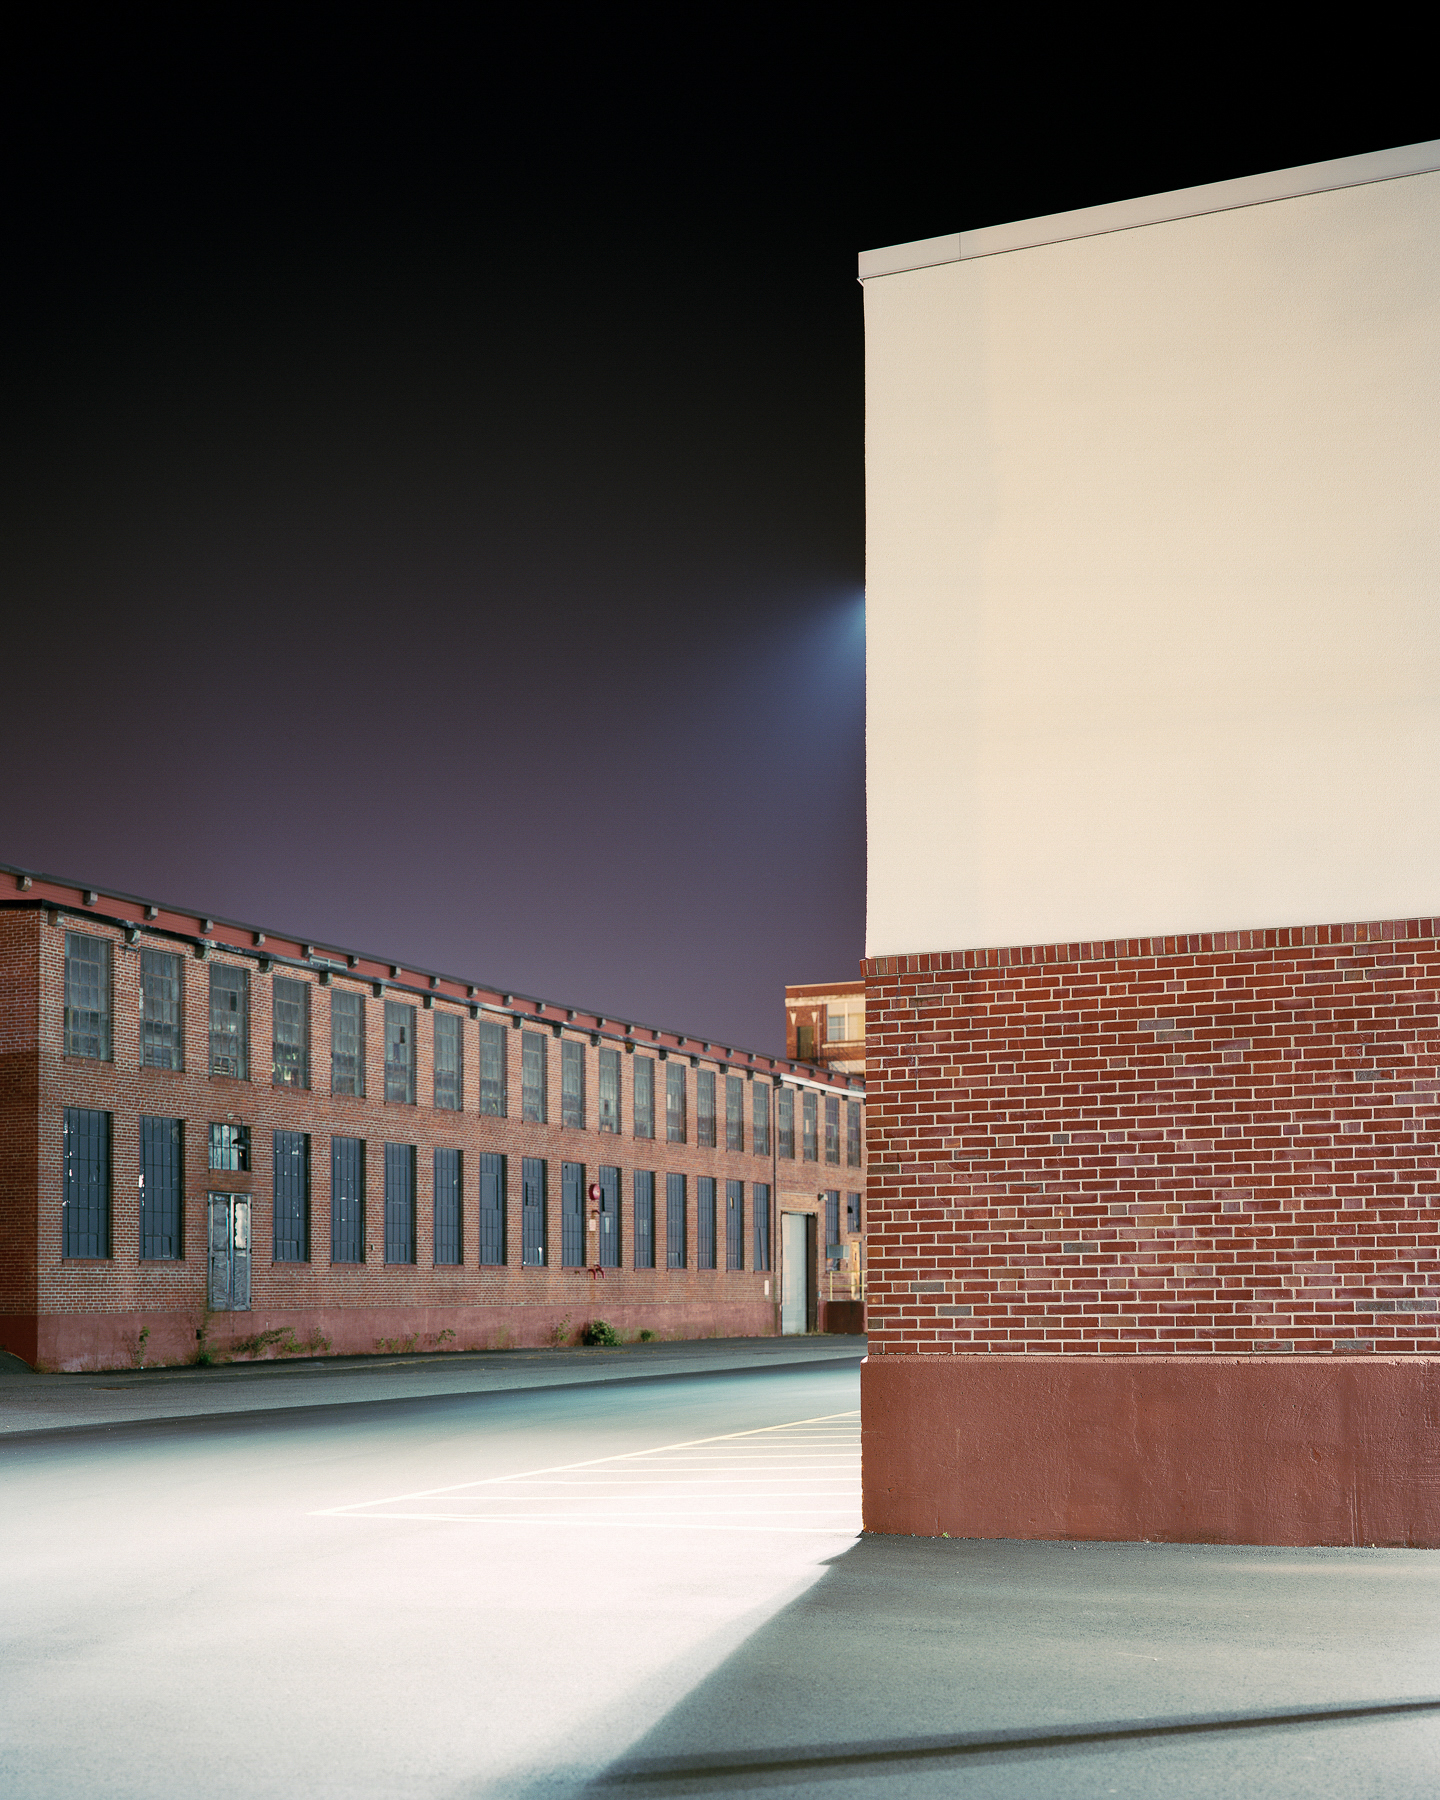 Brick_and_glass-Paul_Puiia-9.jpg